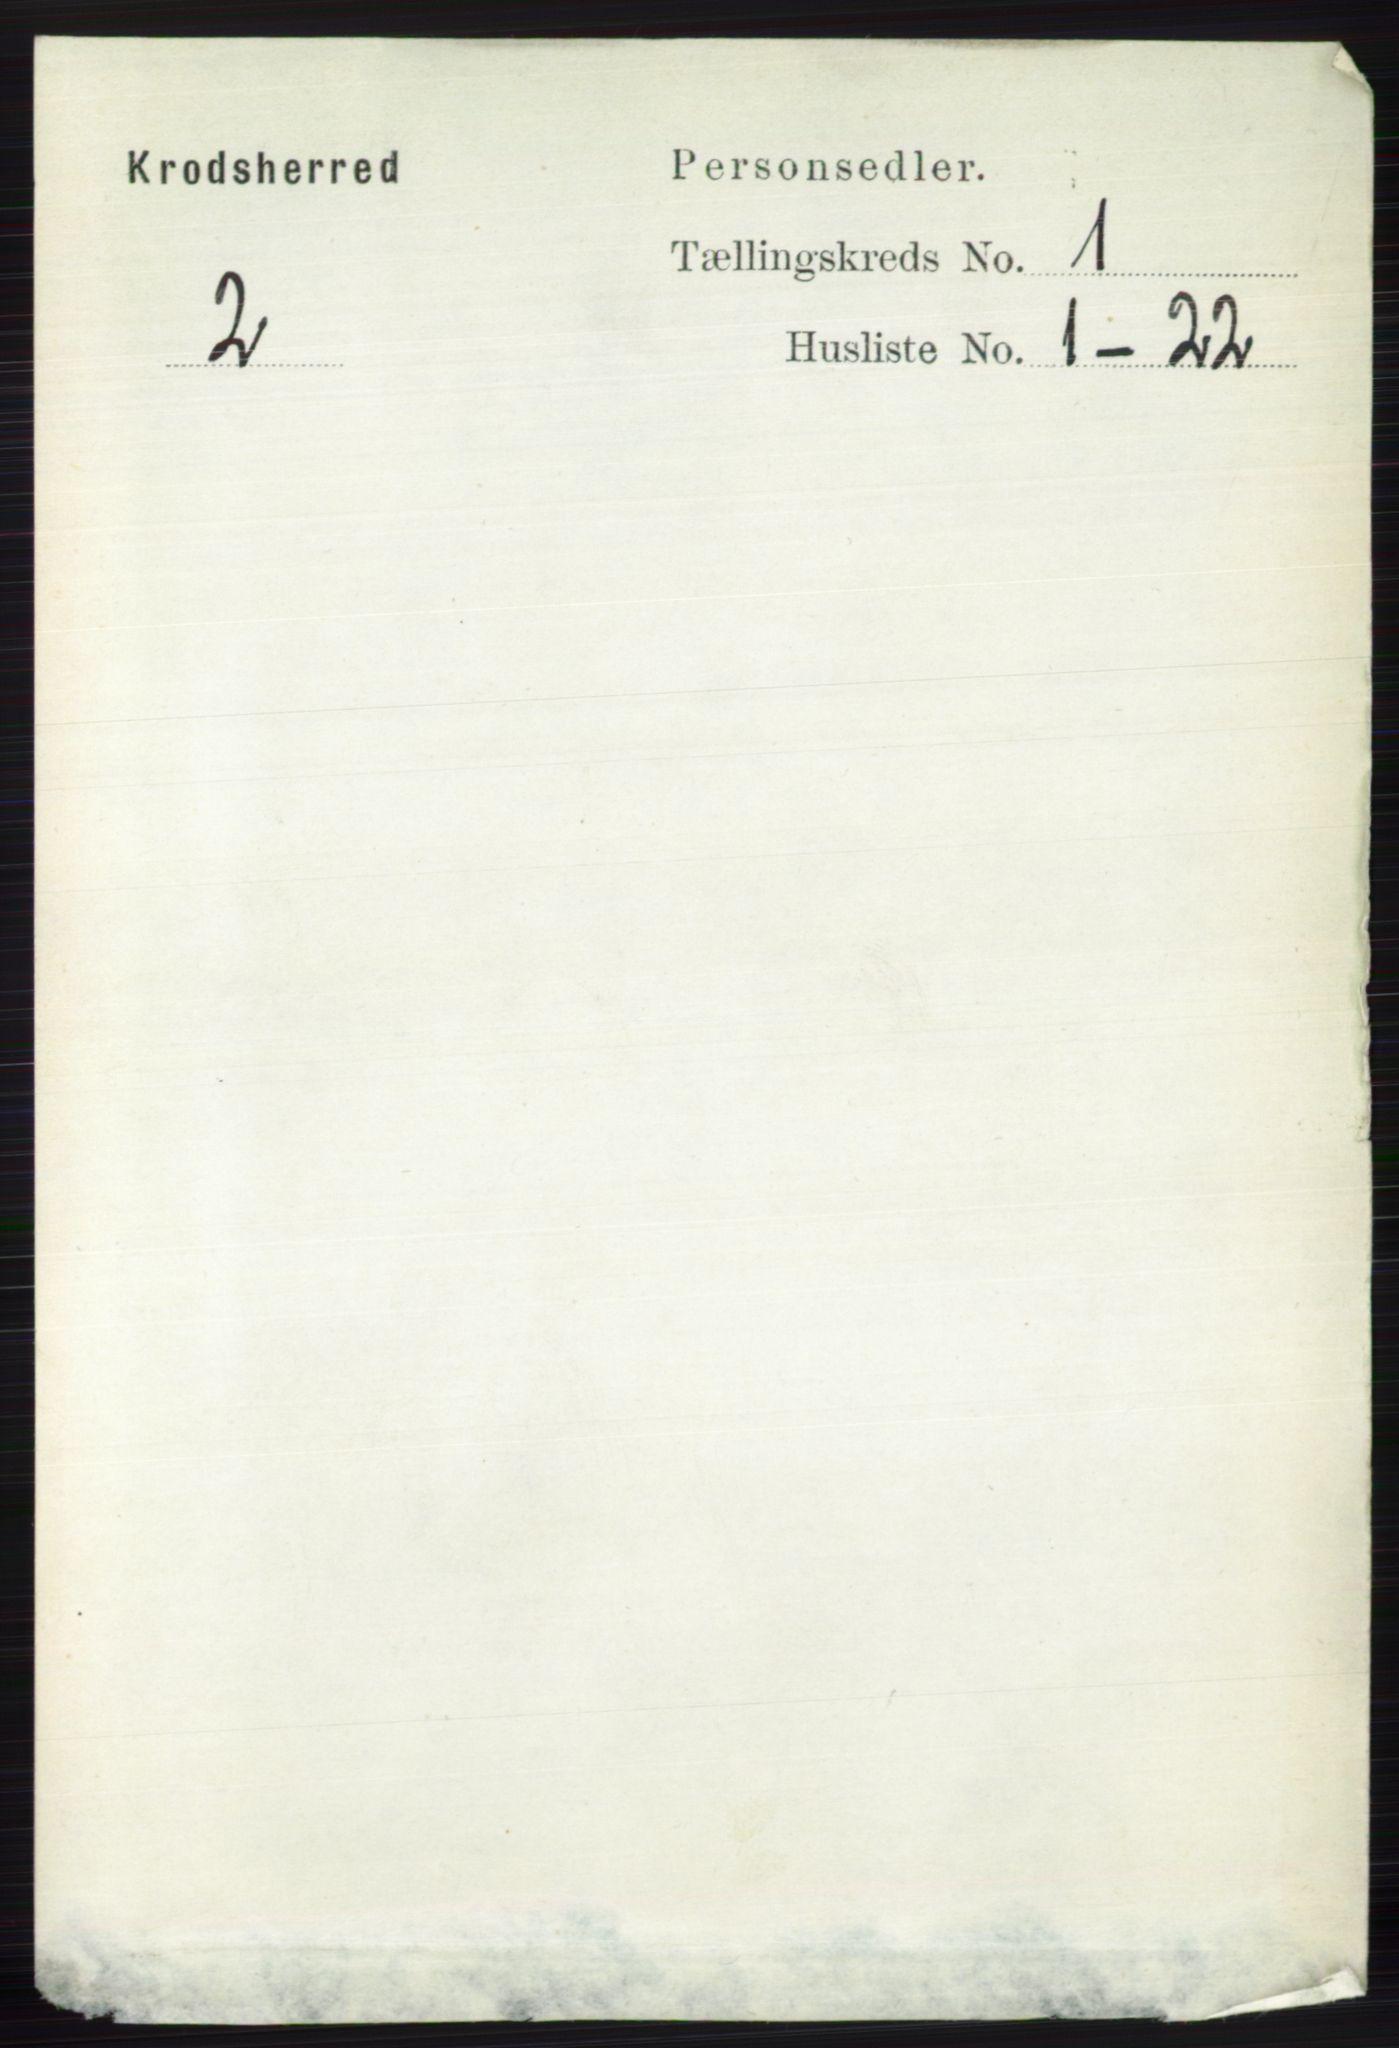 RA, Folketelling 1891 for 0621 Sigdal herred, 1891, s. 4975